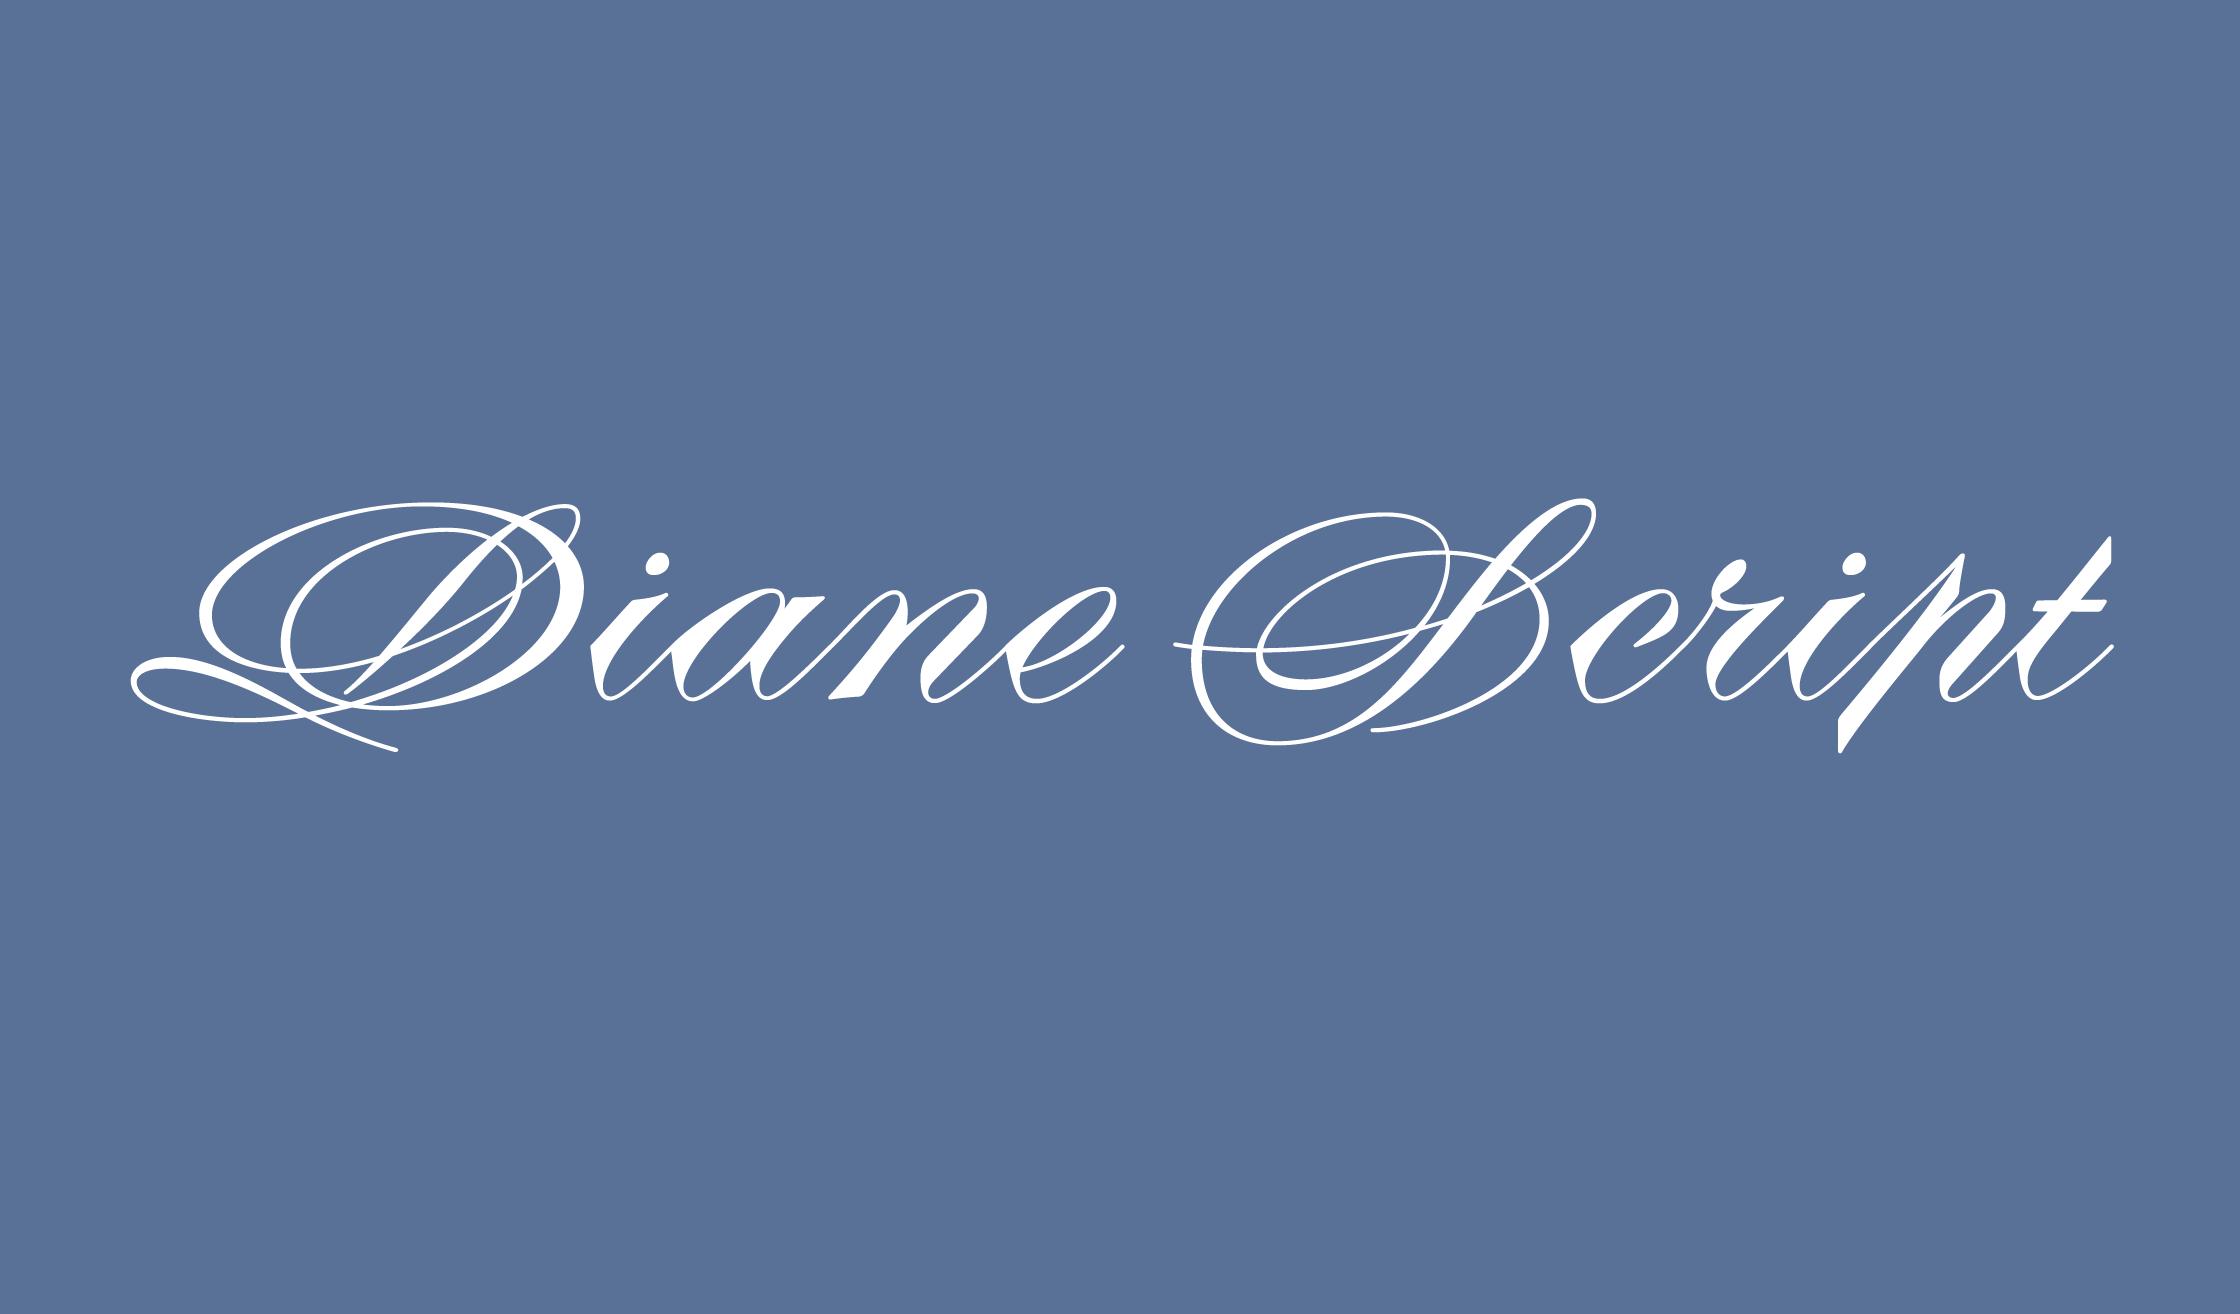 Diane Script Banner Name 2240